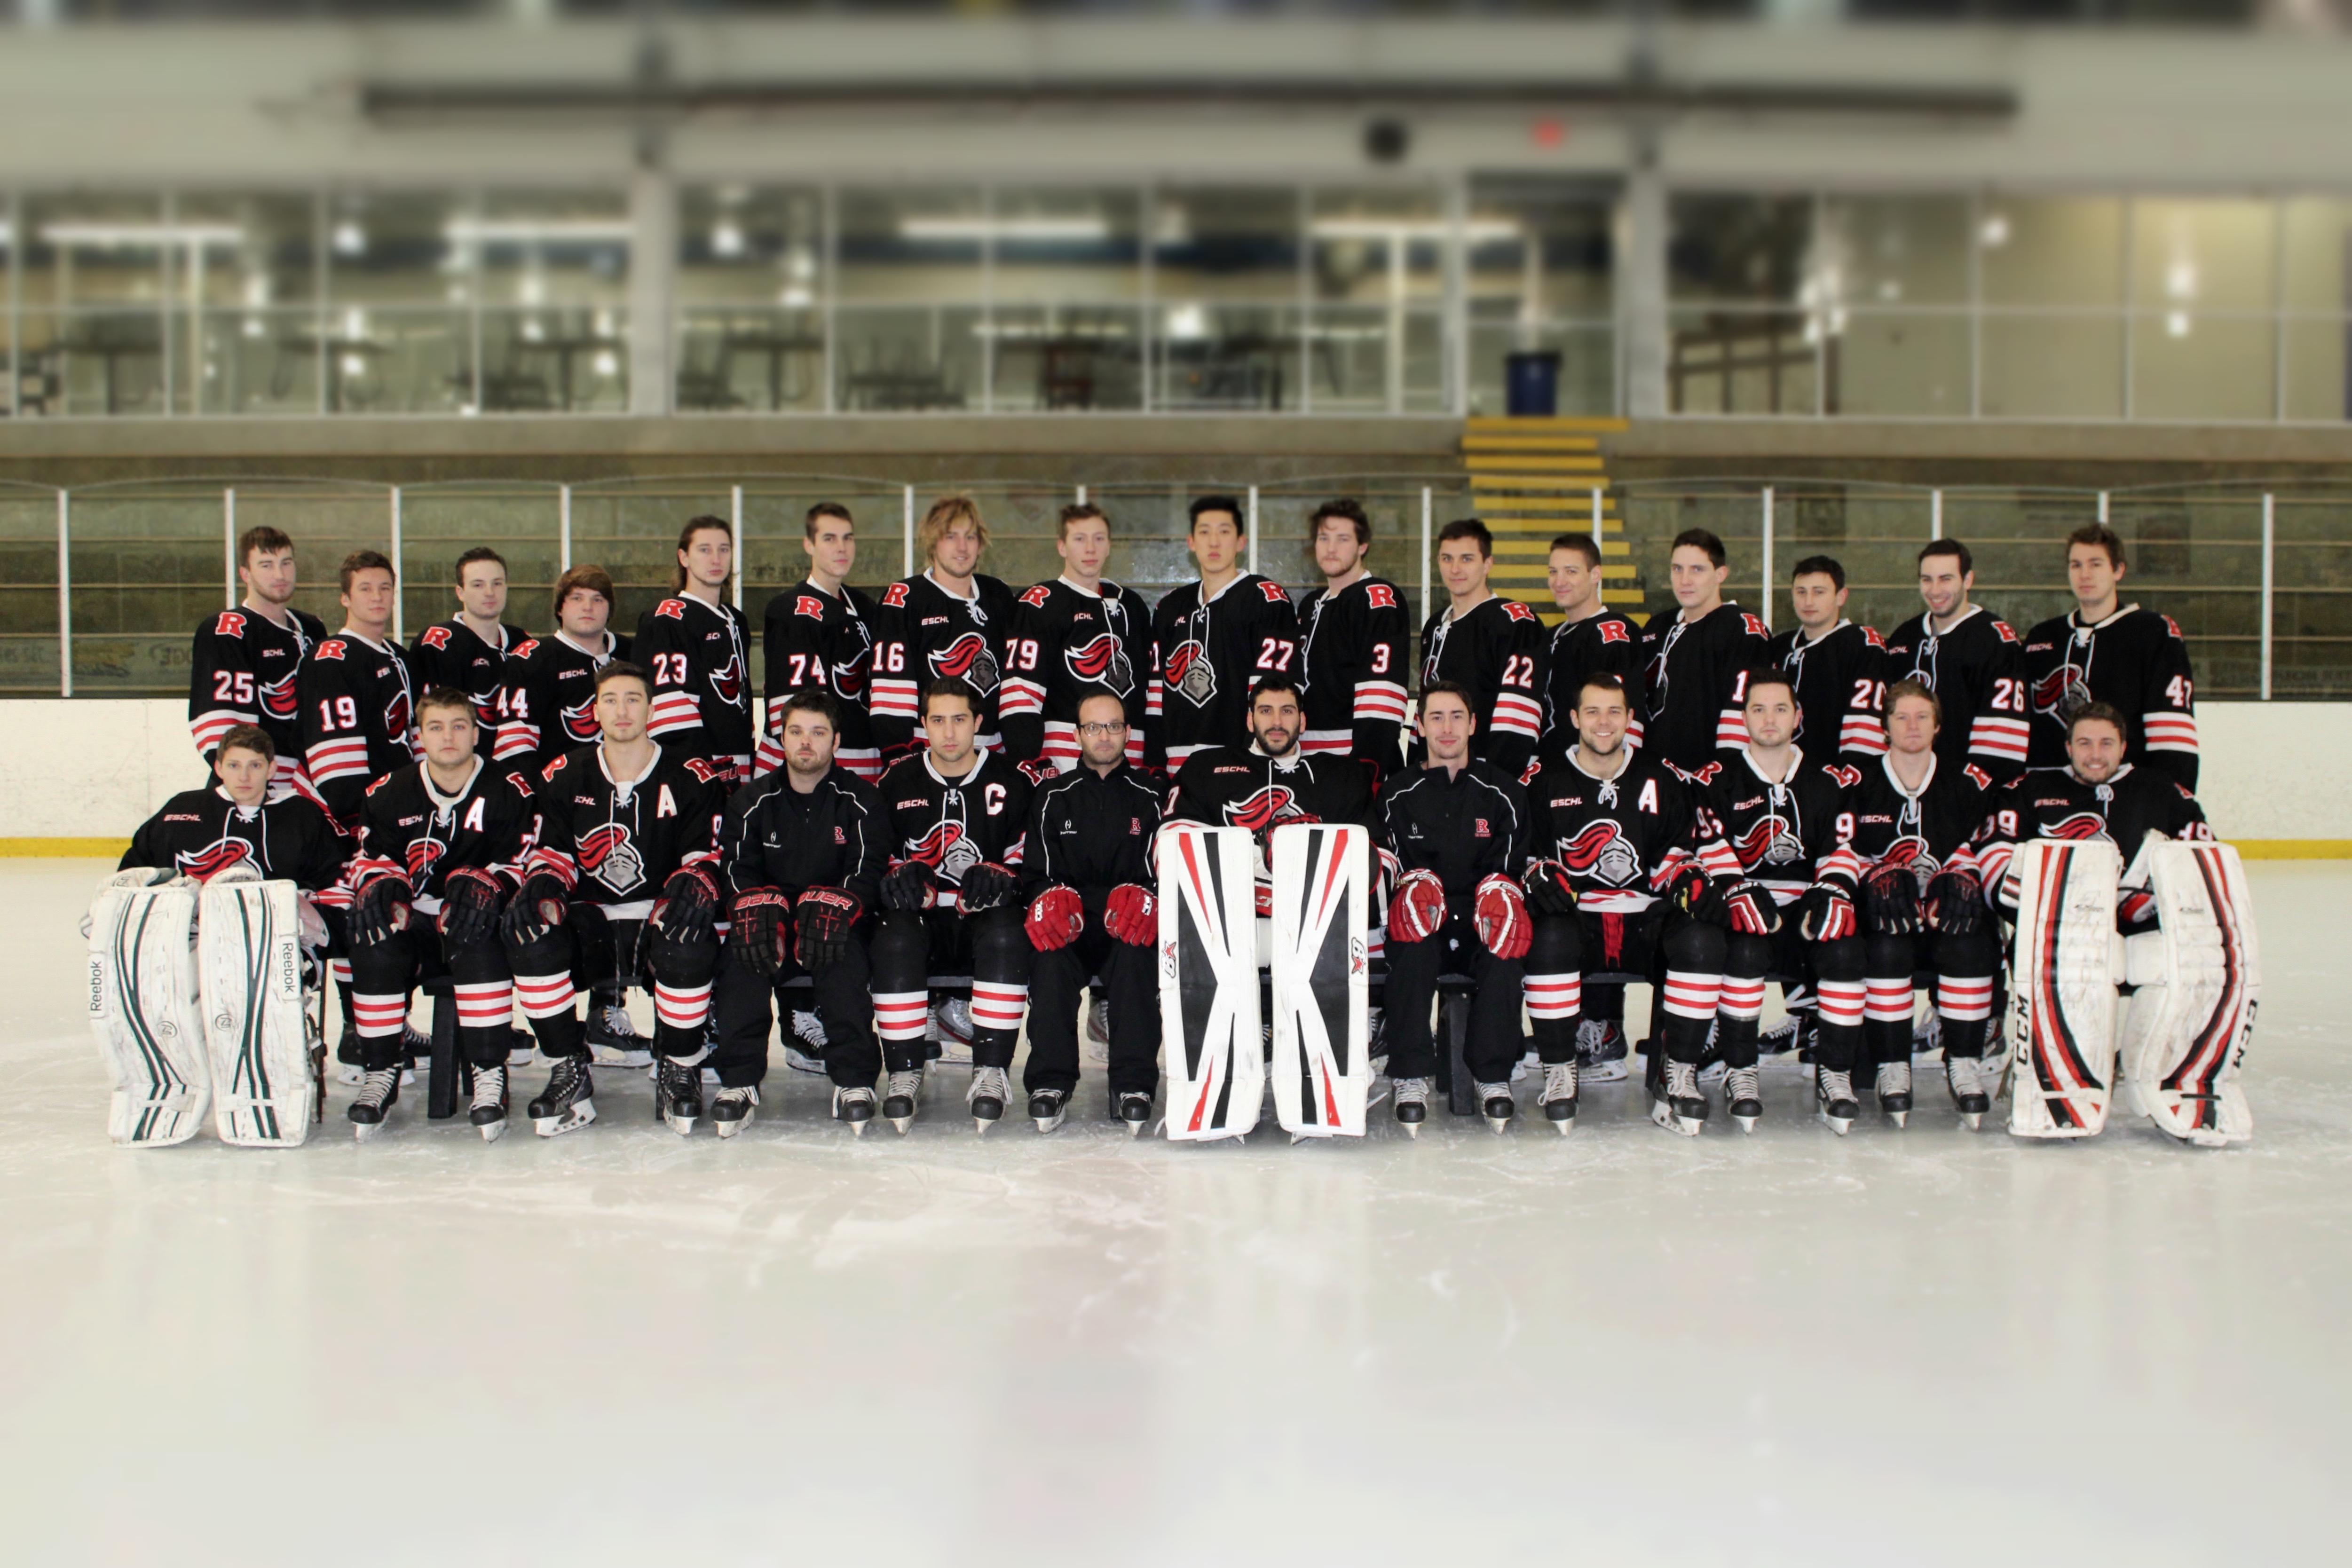 2015 - 2016 D1 Ice Knights Team Photo